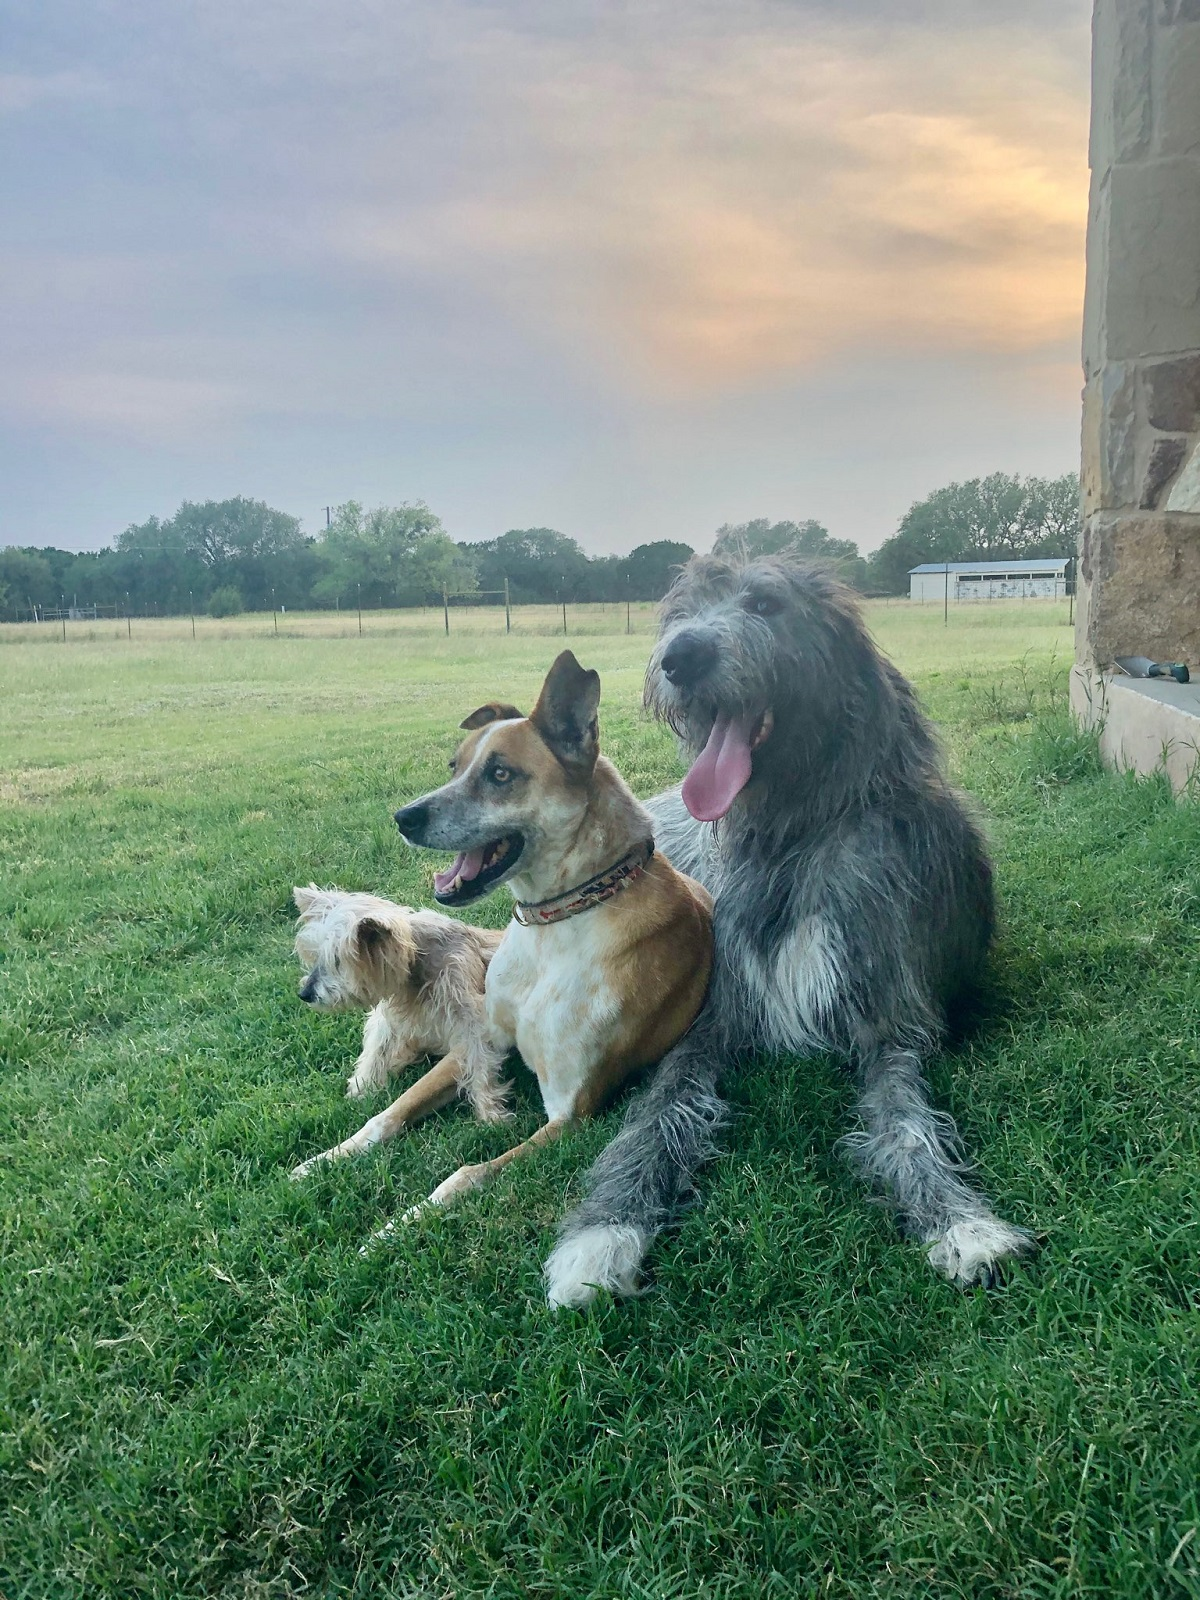 All 3 dogs - Copy.jpg